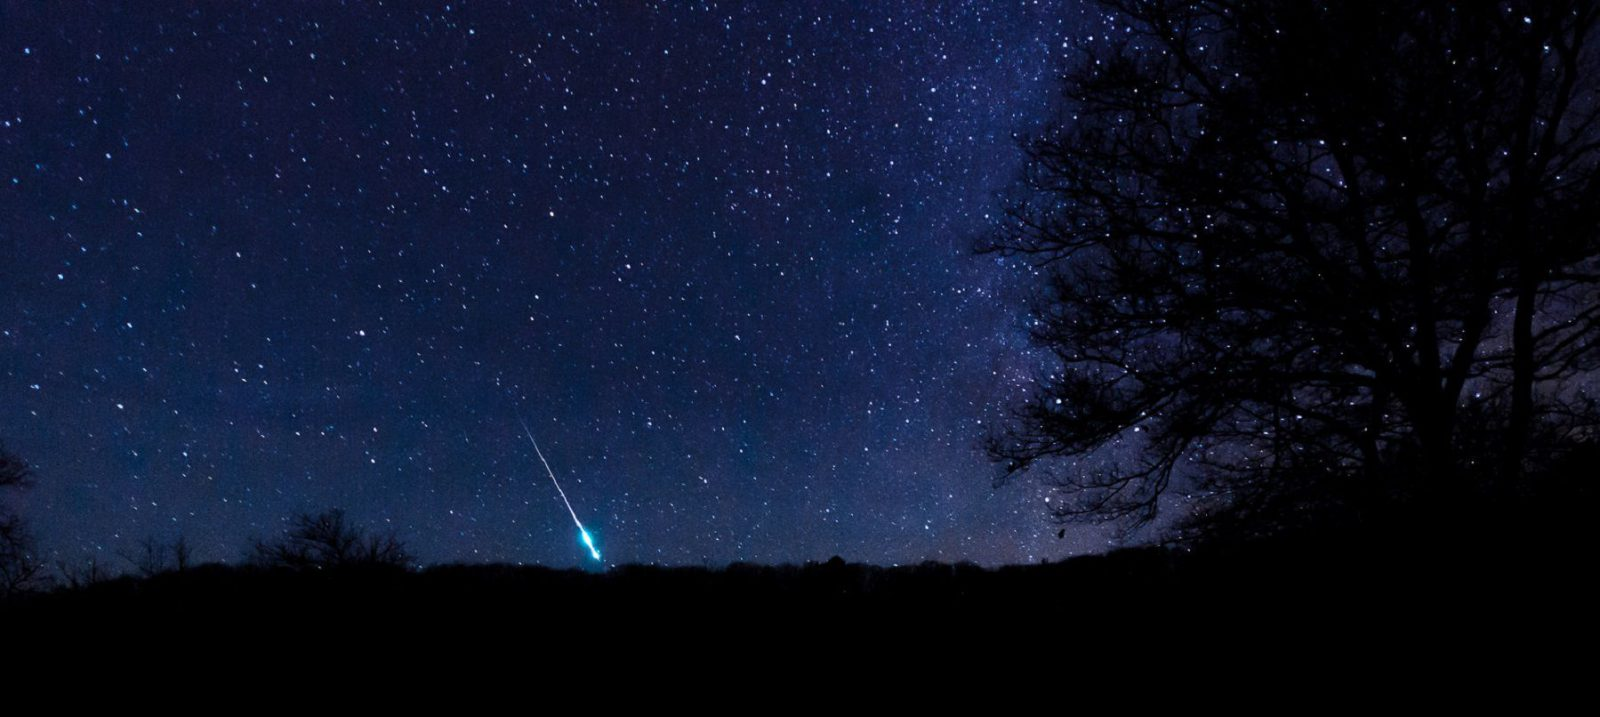 Meteor falling